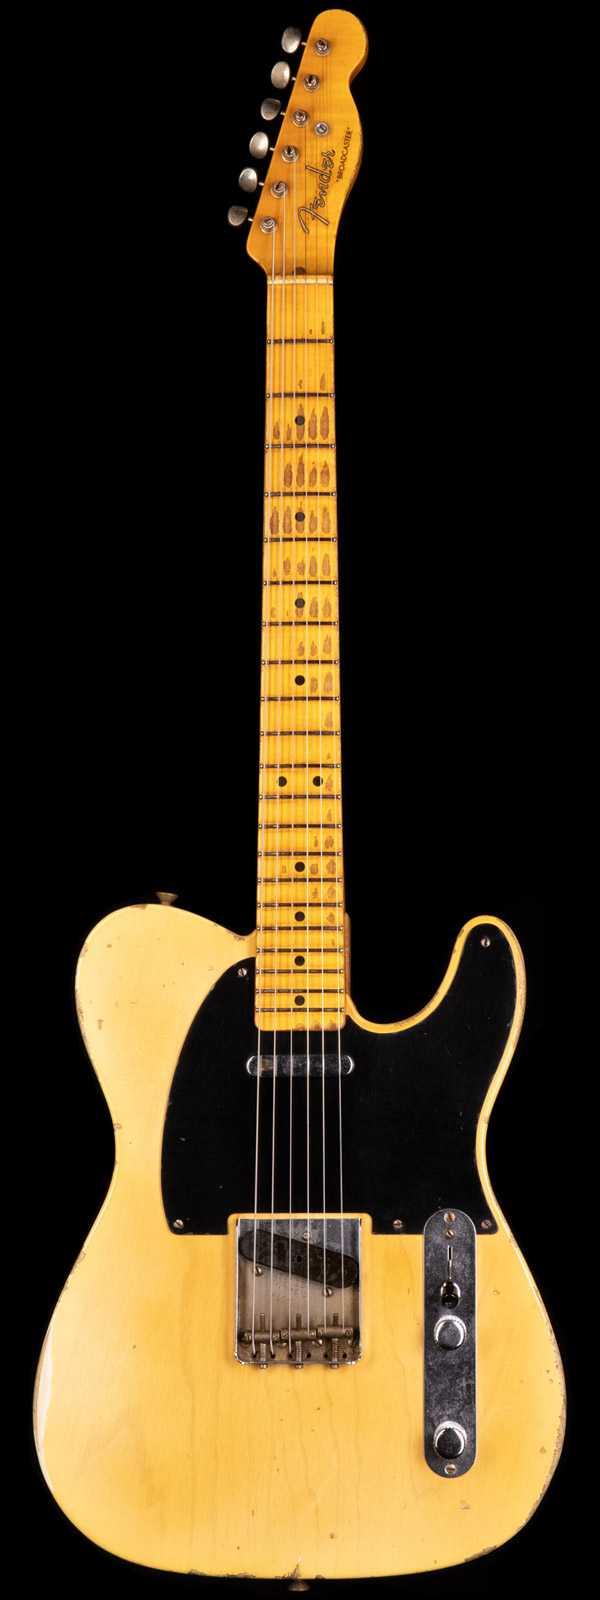 Fender Custom Shop Masterbuilt Kyle McMillin LTD 70th Anniversary Broadcaster Relic Faded Nocaster Blonde